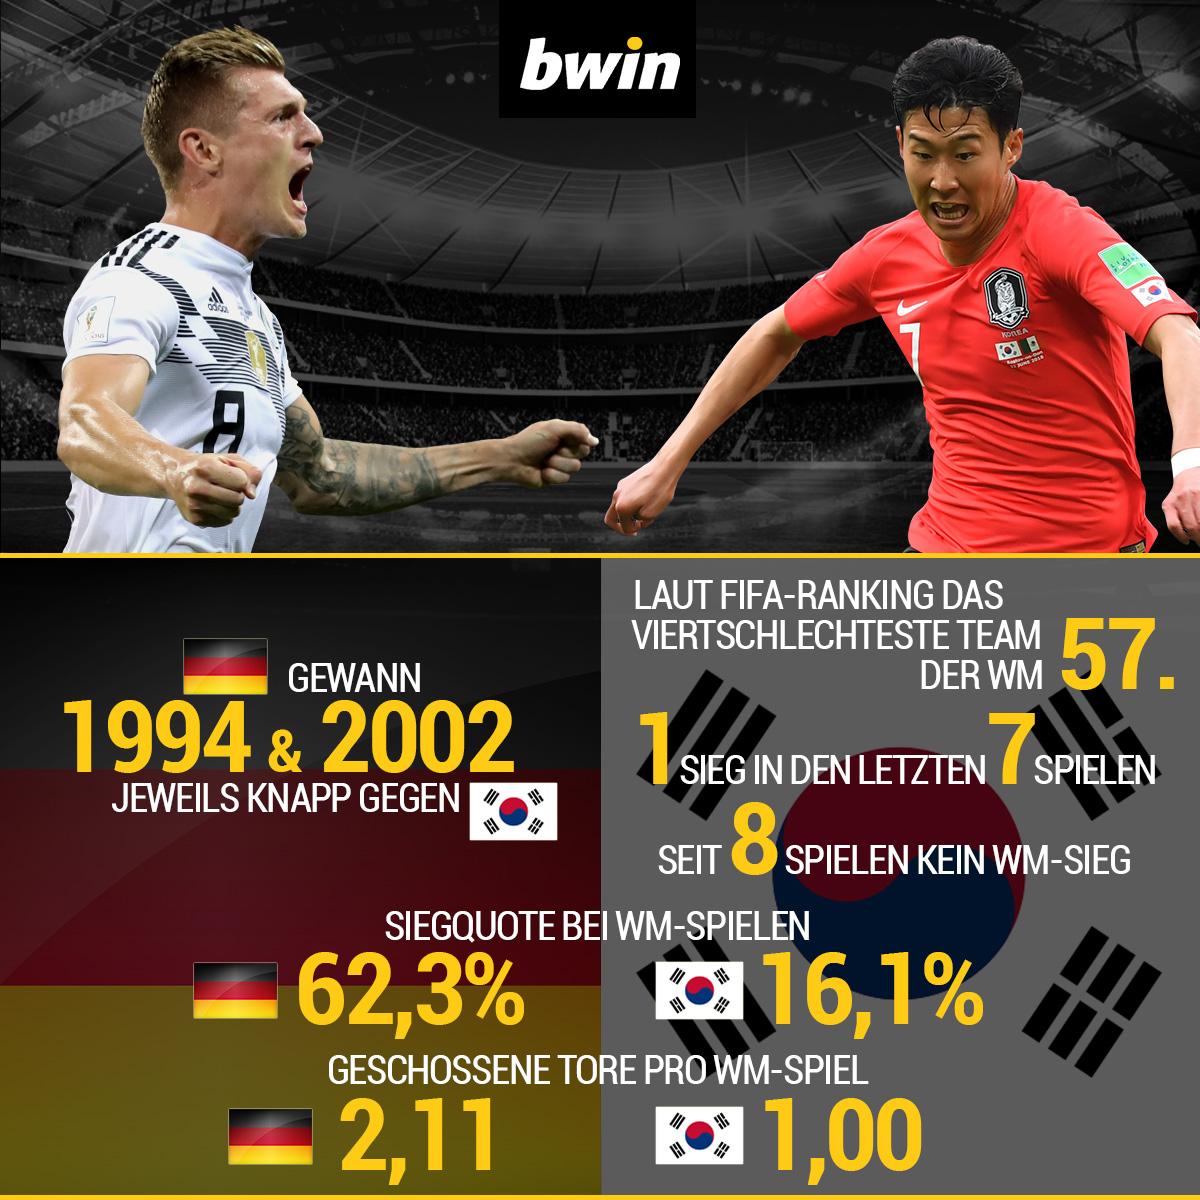 Deutschland, Südkorea, Infografik, WM 2018, bwin